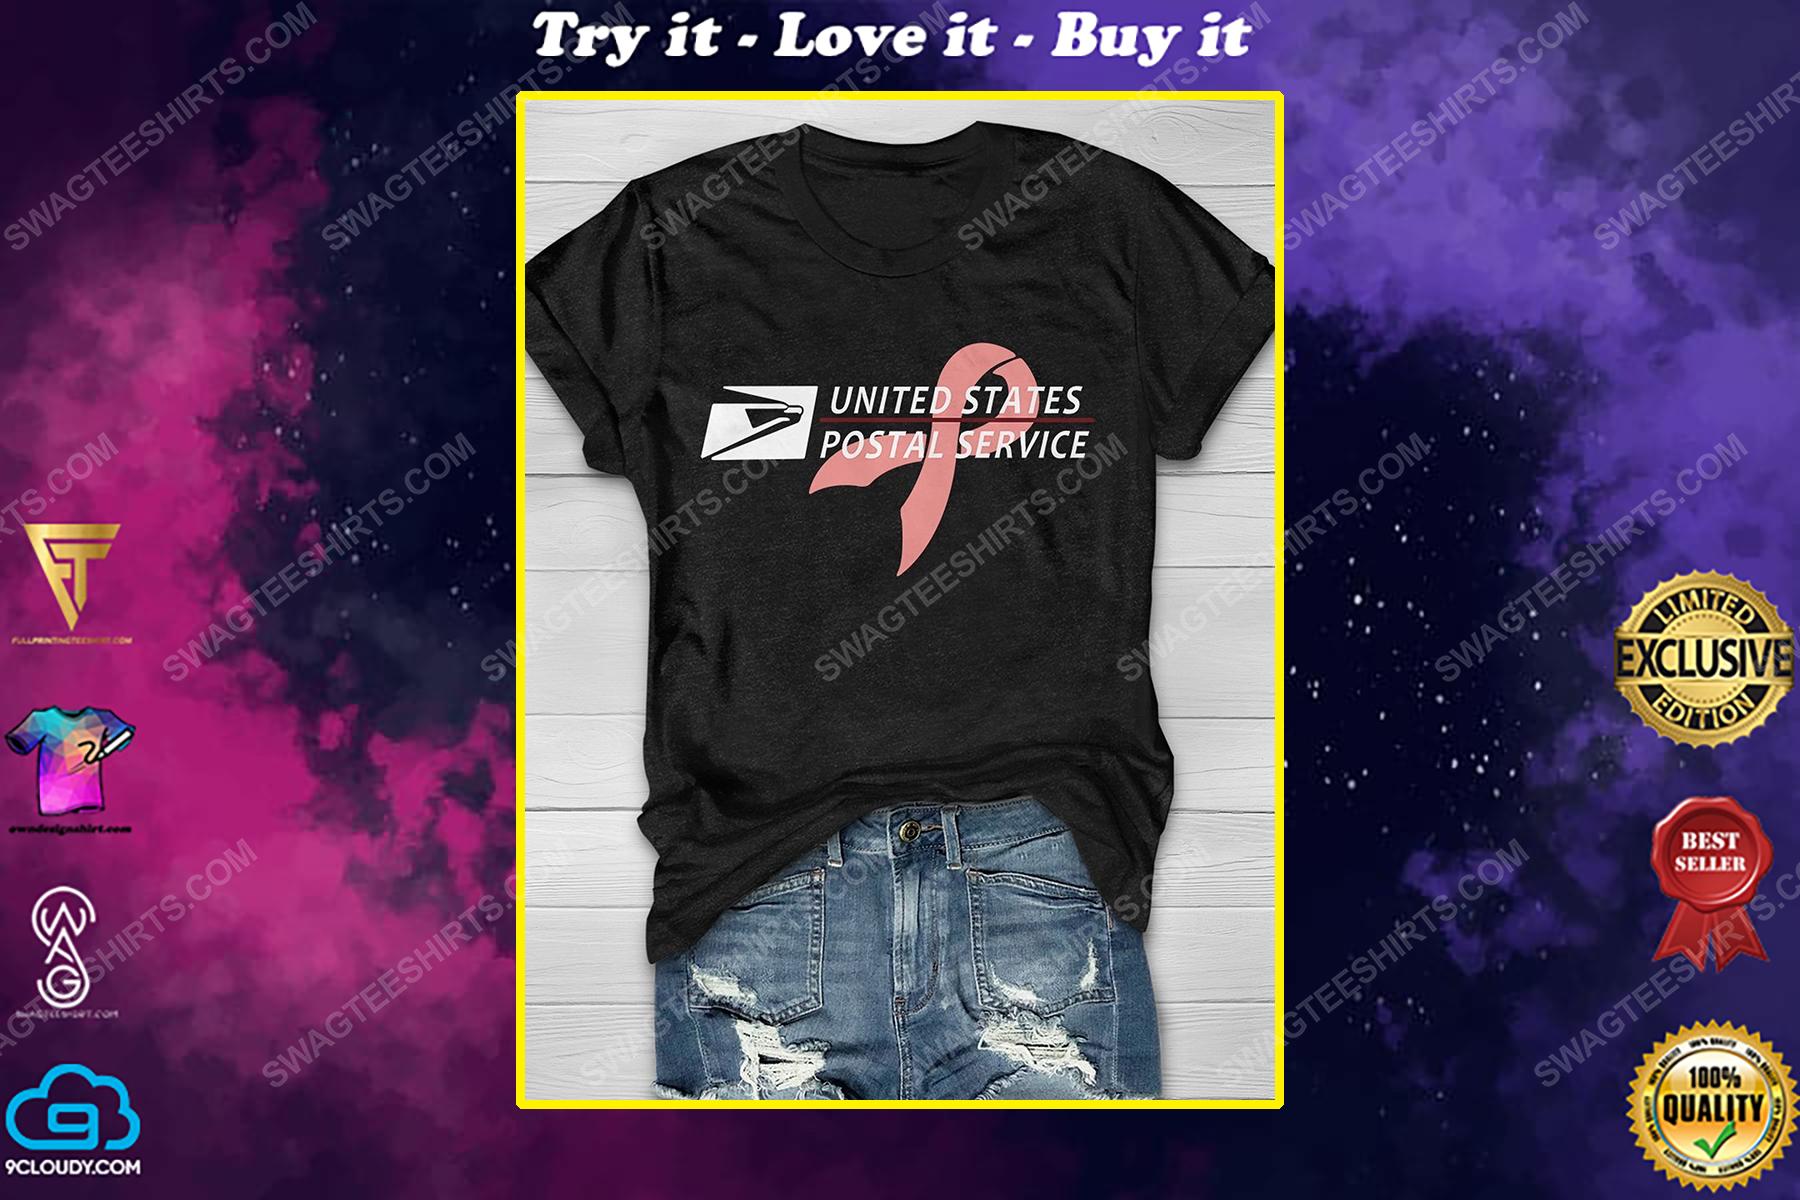 Breast cancer awareness united states postal service shirt